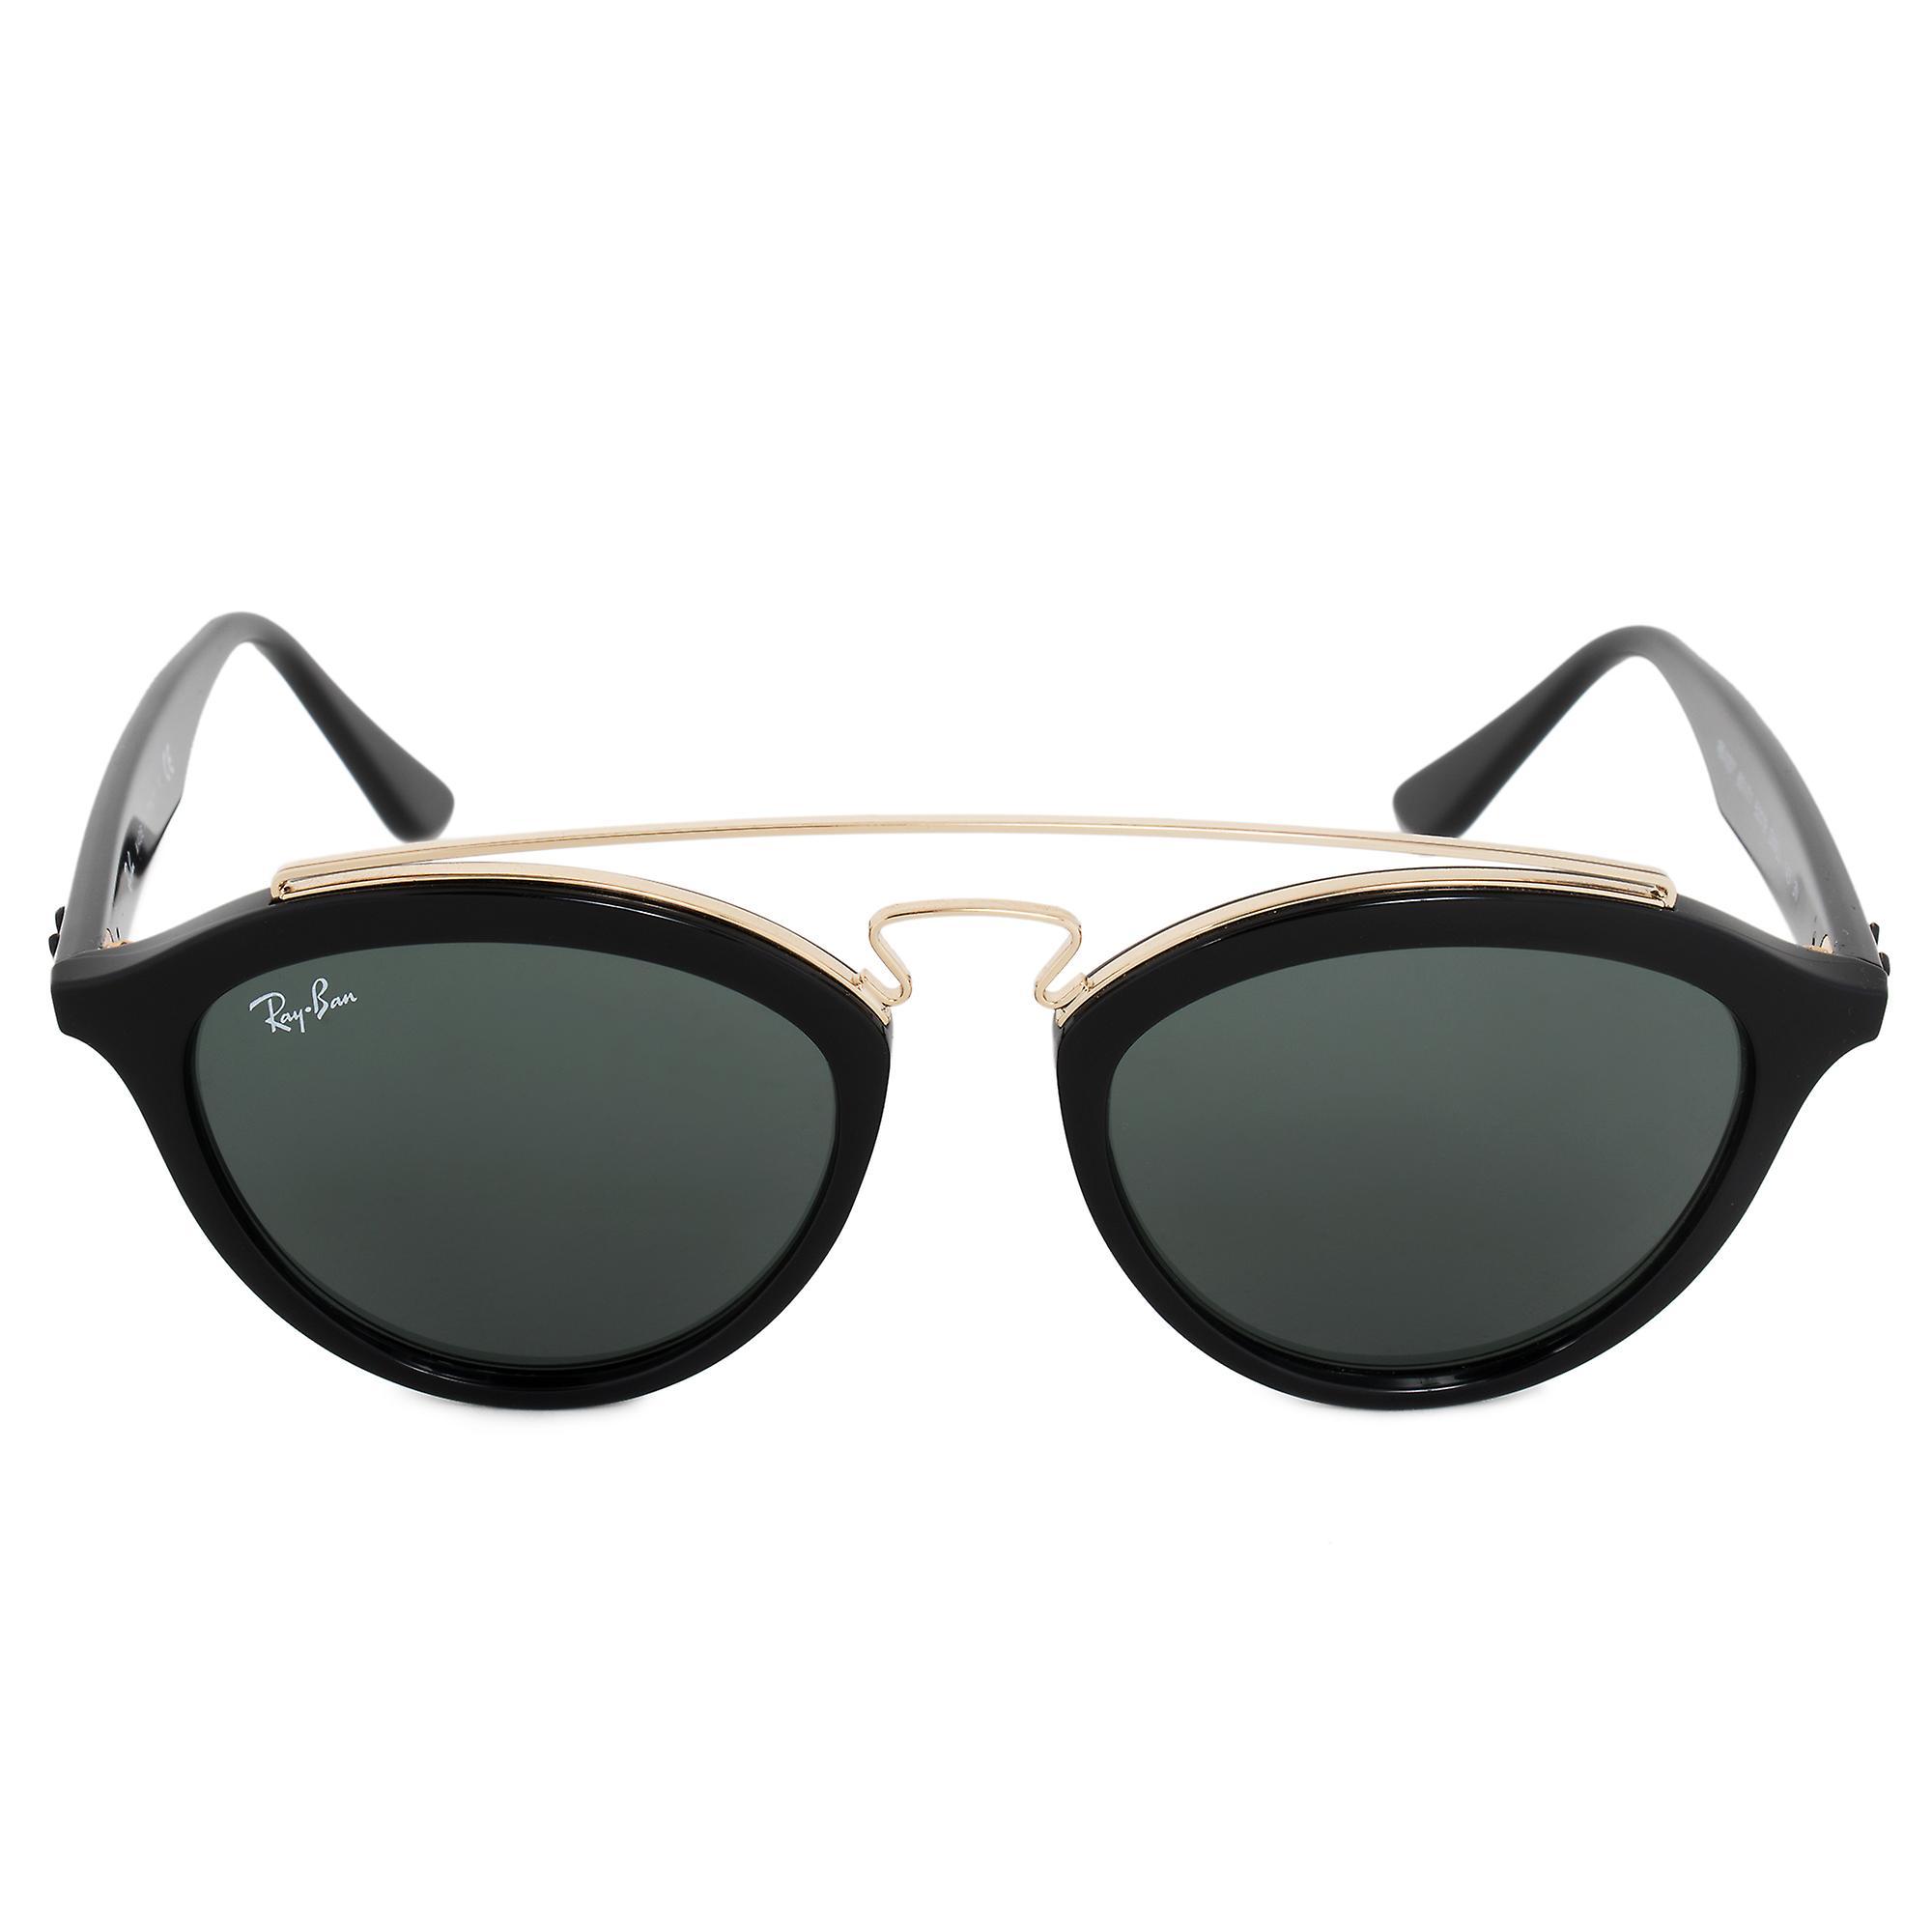 e1aa11ea8c Ray-Ban Round Sunglasses RB4257 60171 50